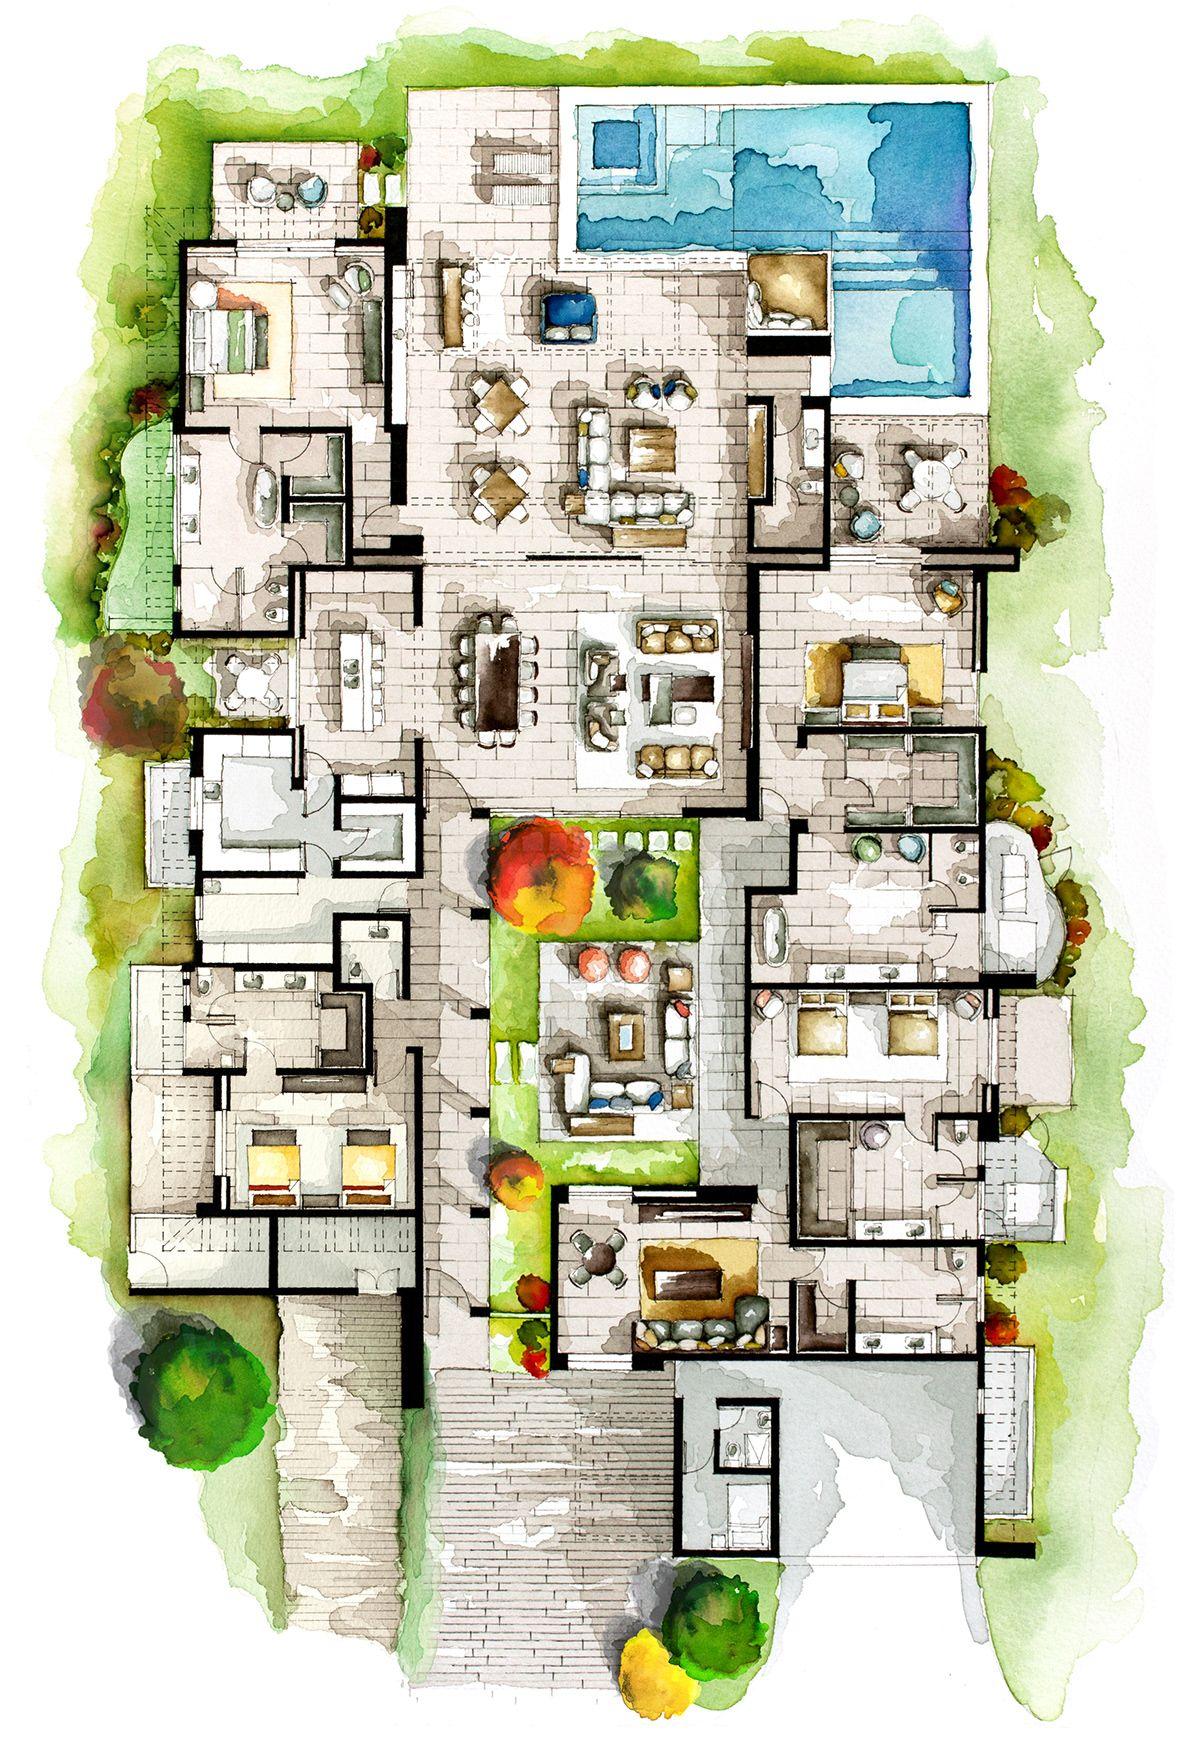 Real Estate Watercolor 2d Floor Plans Part 5 On Behance Architectural Floor Plans Hotel Floor Plan House Layout Plans